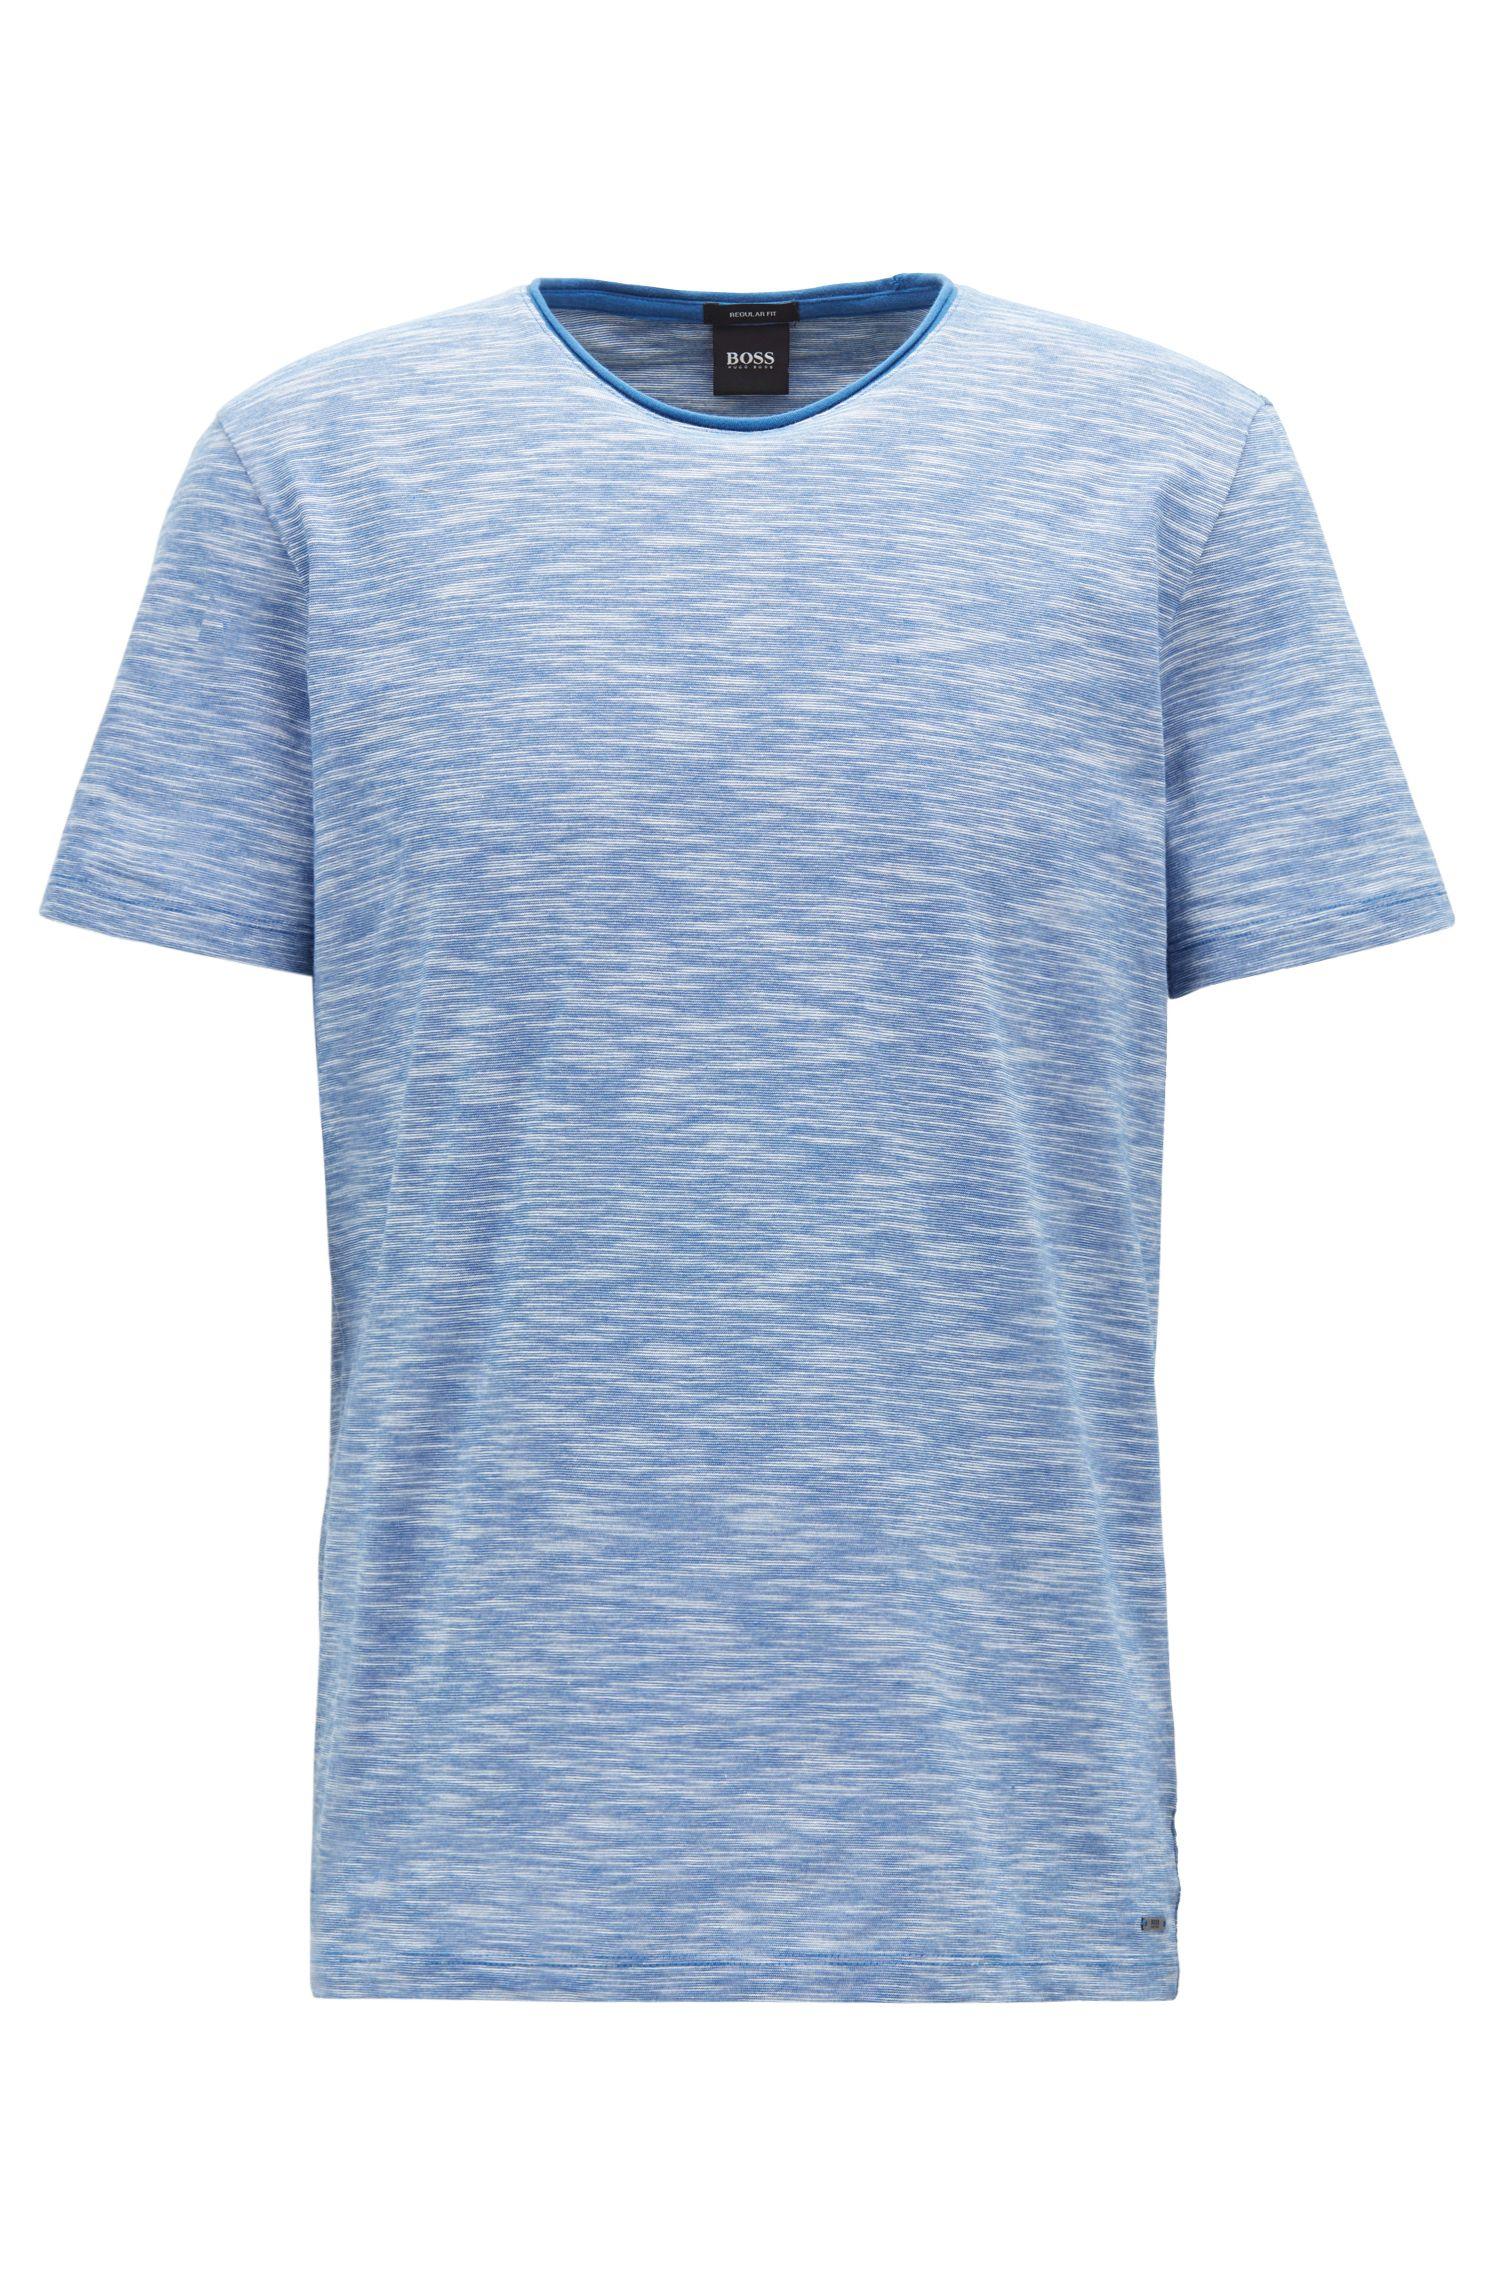 Mouliné T-shirt with raw-cut crew neckline